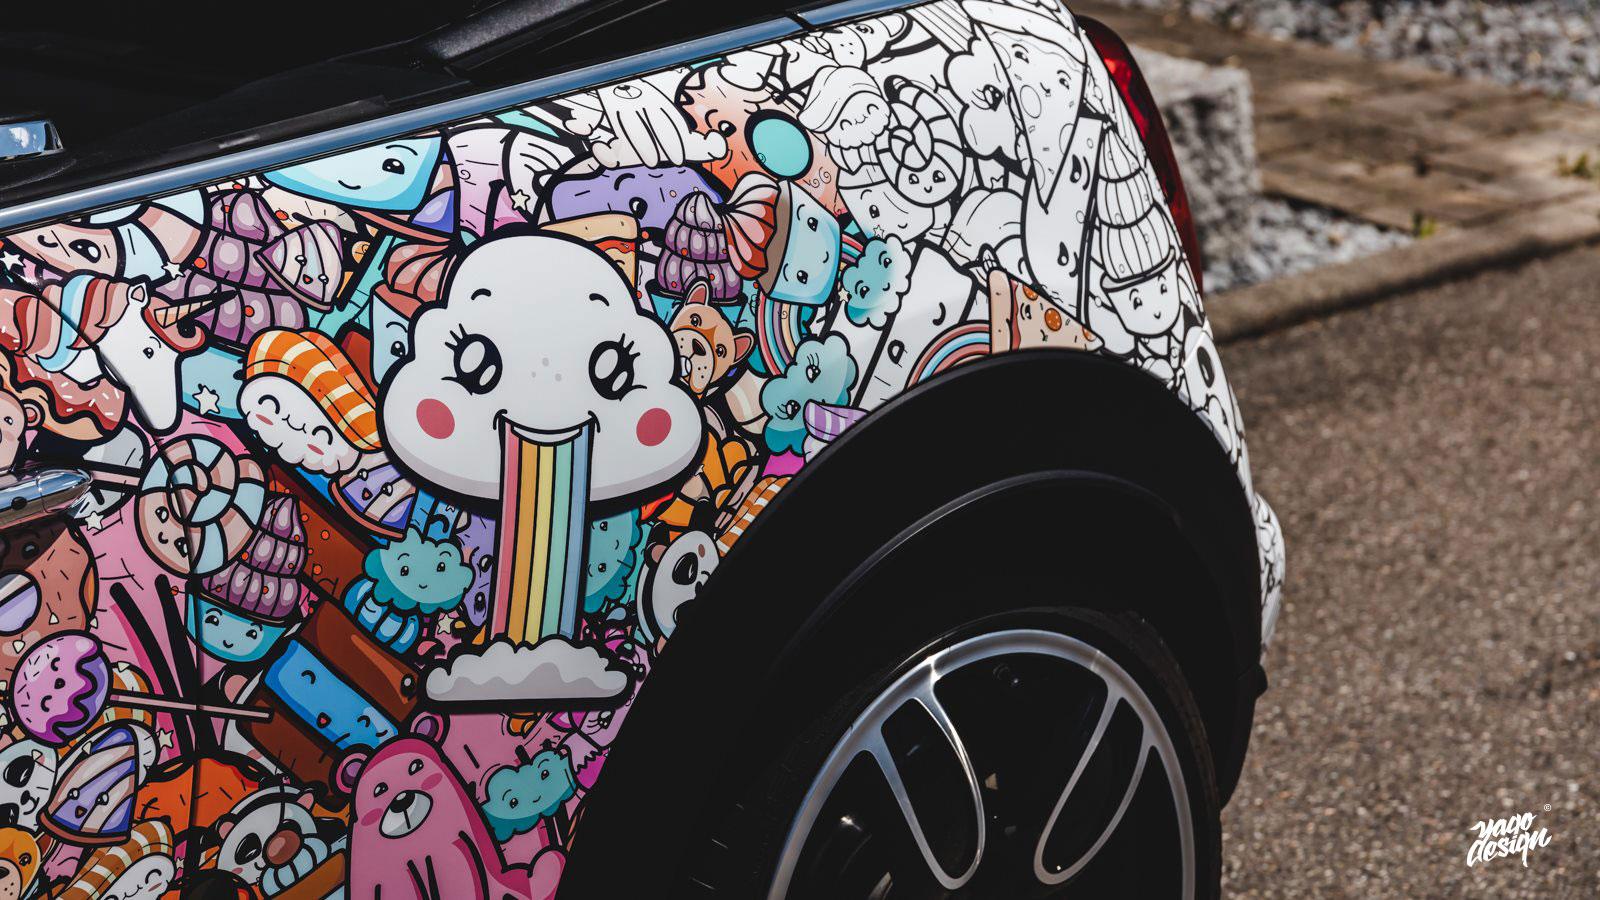 Mini-cooper-JCW-by-Yagodesign-by-Kamil-Lizak-Car-wrapping-Design-Studio-Automotive-Design-Studio-Kawai-9